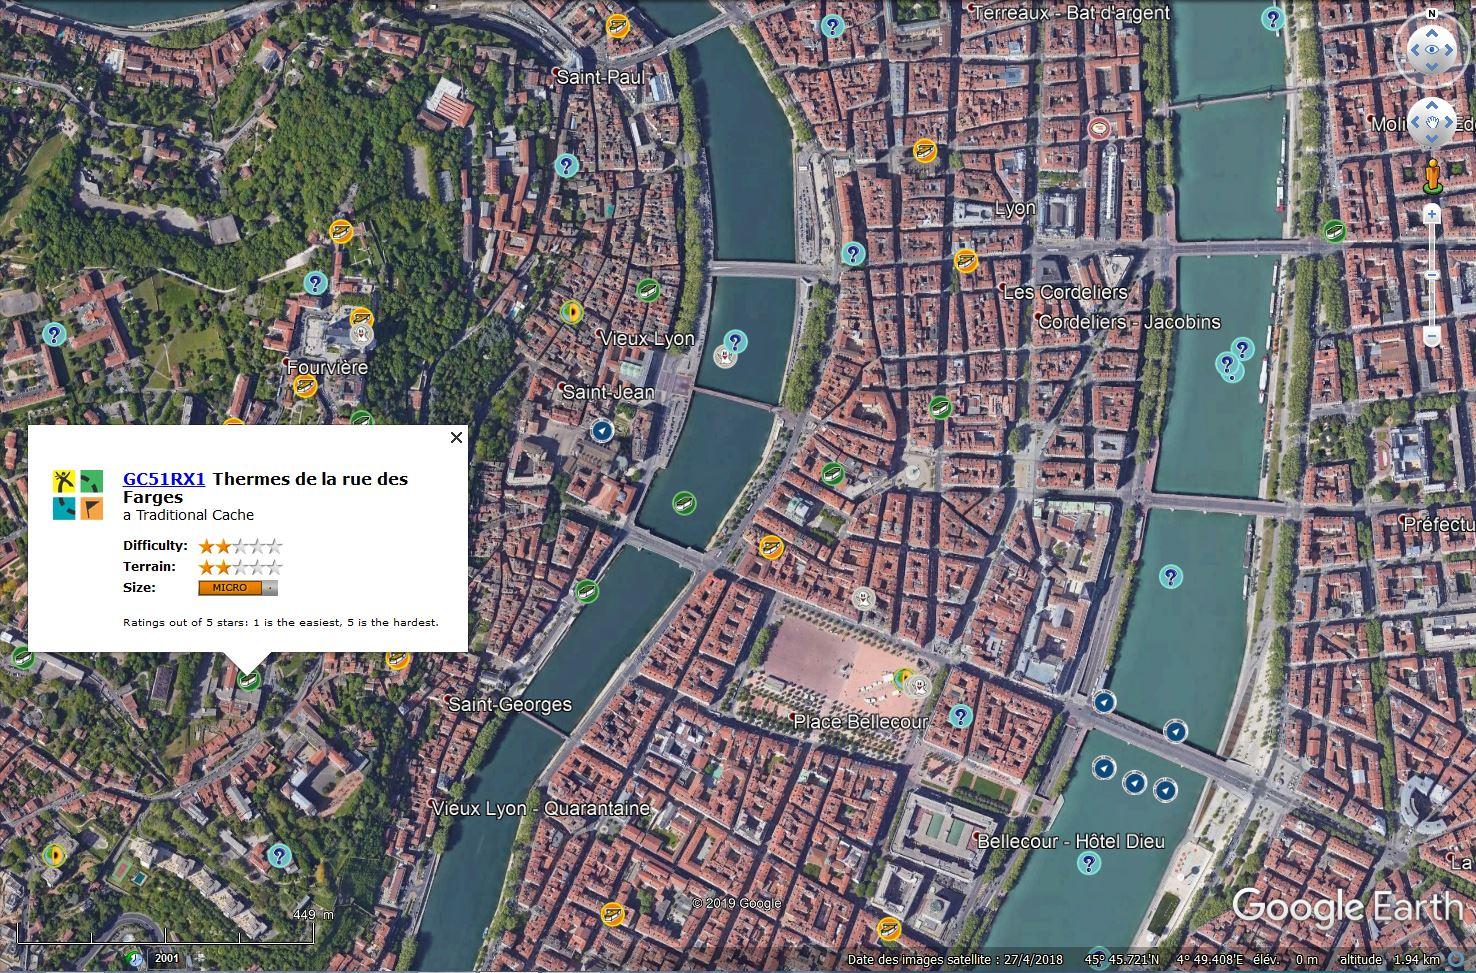 [KML] Geocaching Google Earth Viewer Tsge_970